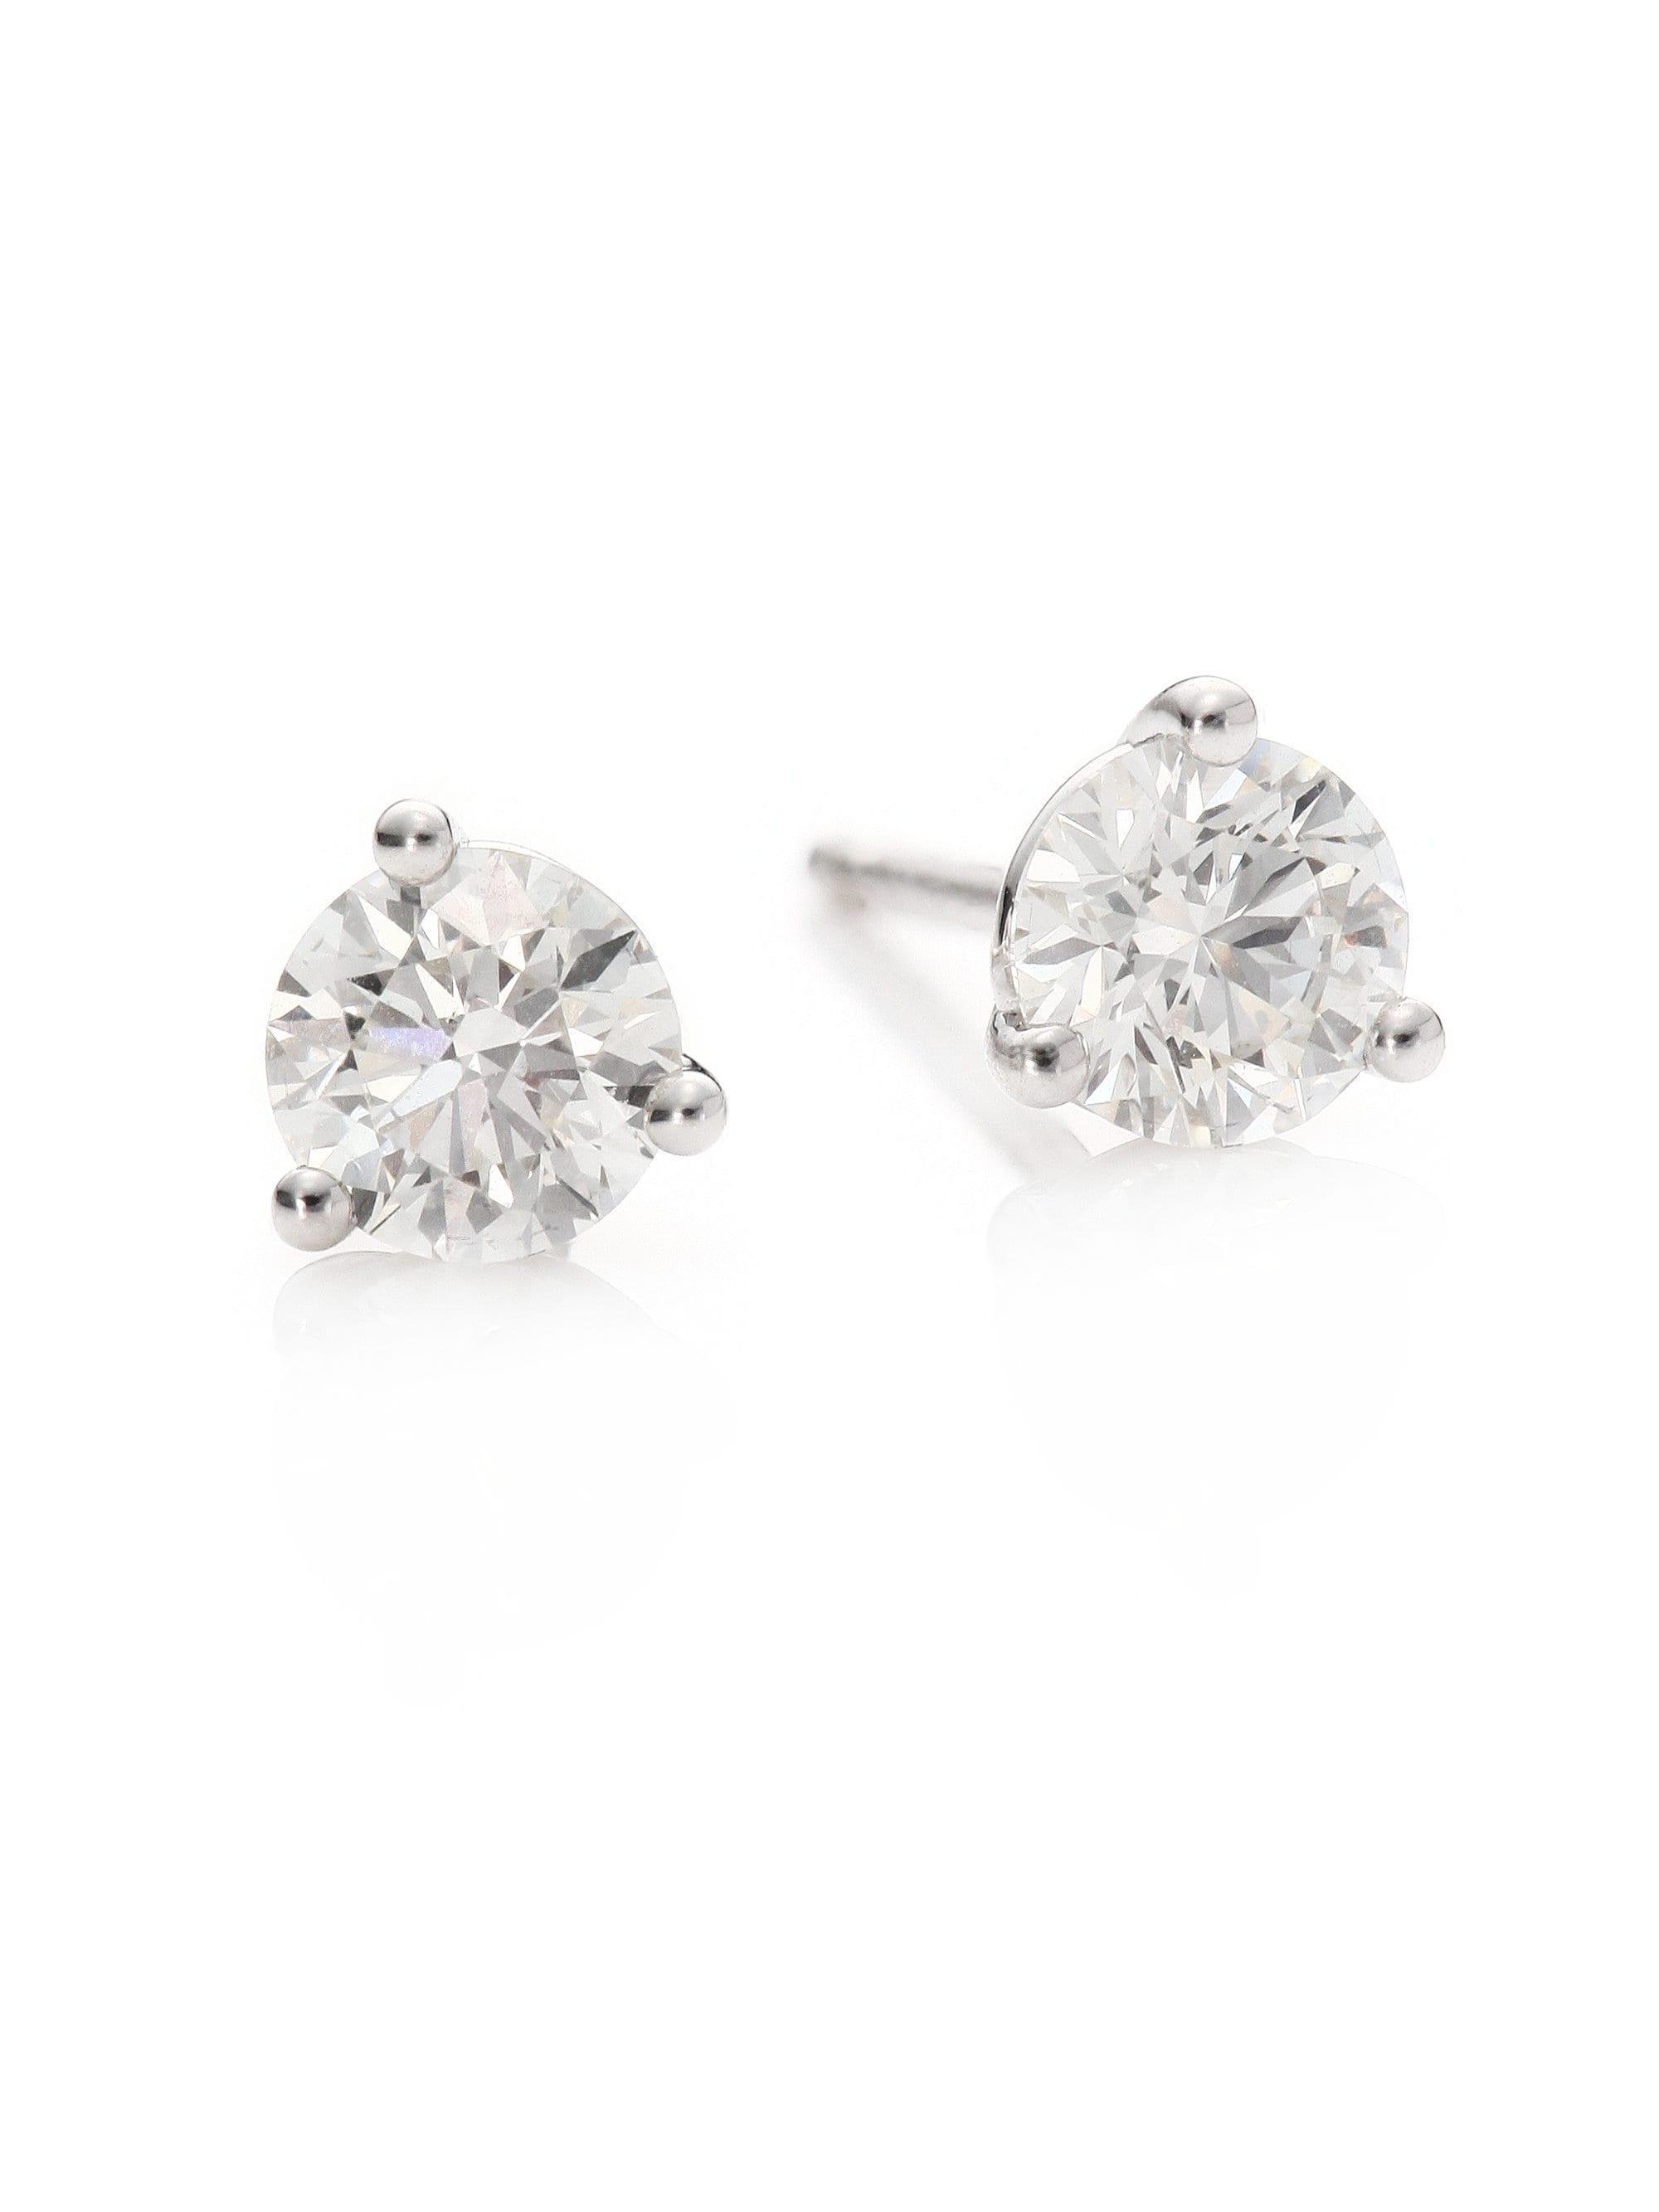 abd8e7eb0 Hearts On Fire Diamond & 18k White Gold Three-prong Stud Earrings in ...